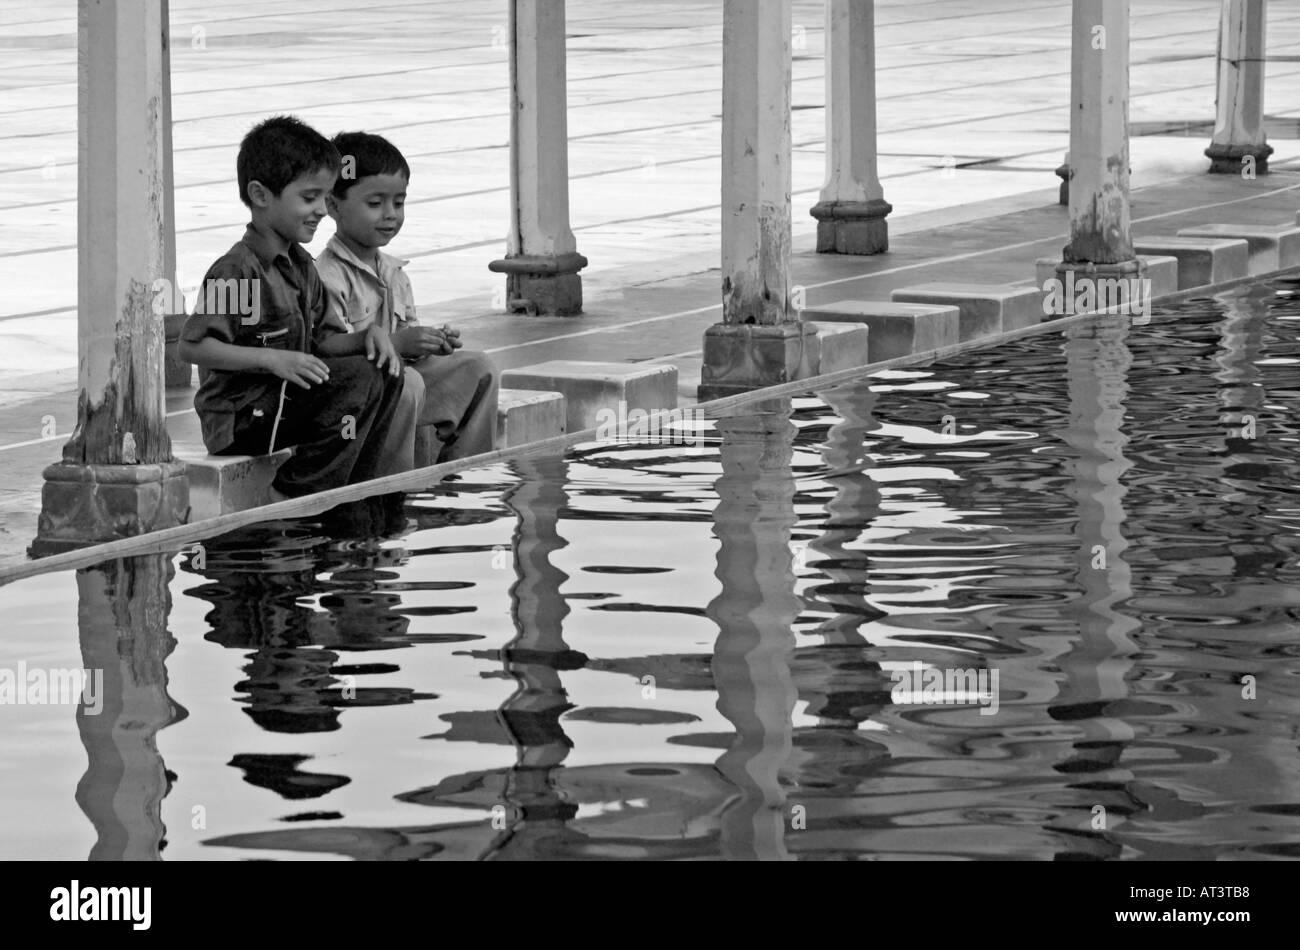 Two Boys Gossiping and Washing at the Jami Masjid Mosque in Ahmedabad, Gujarat India - Stock Image